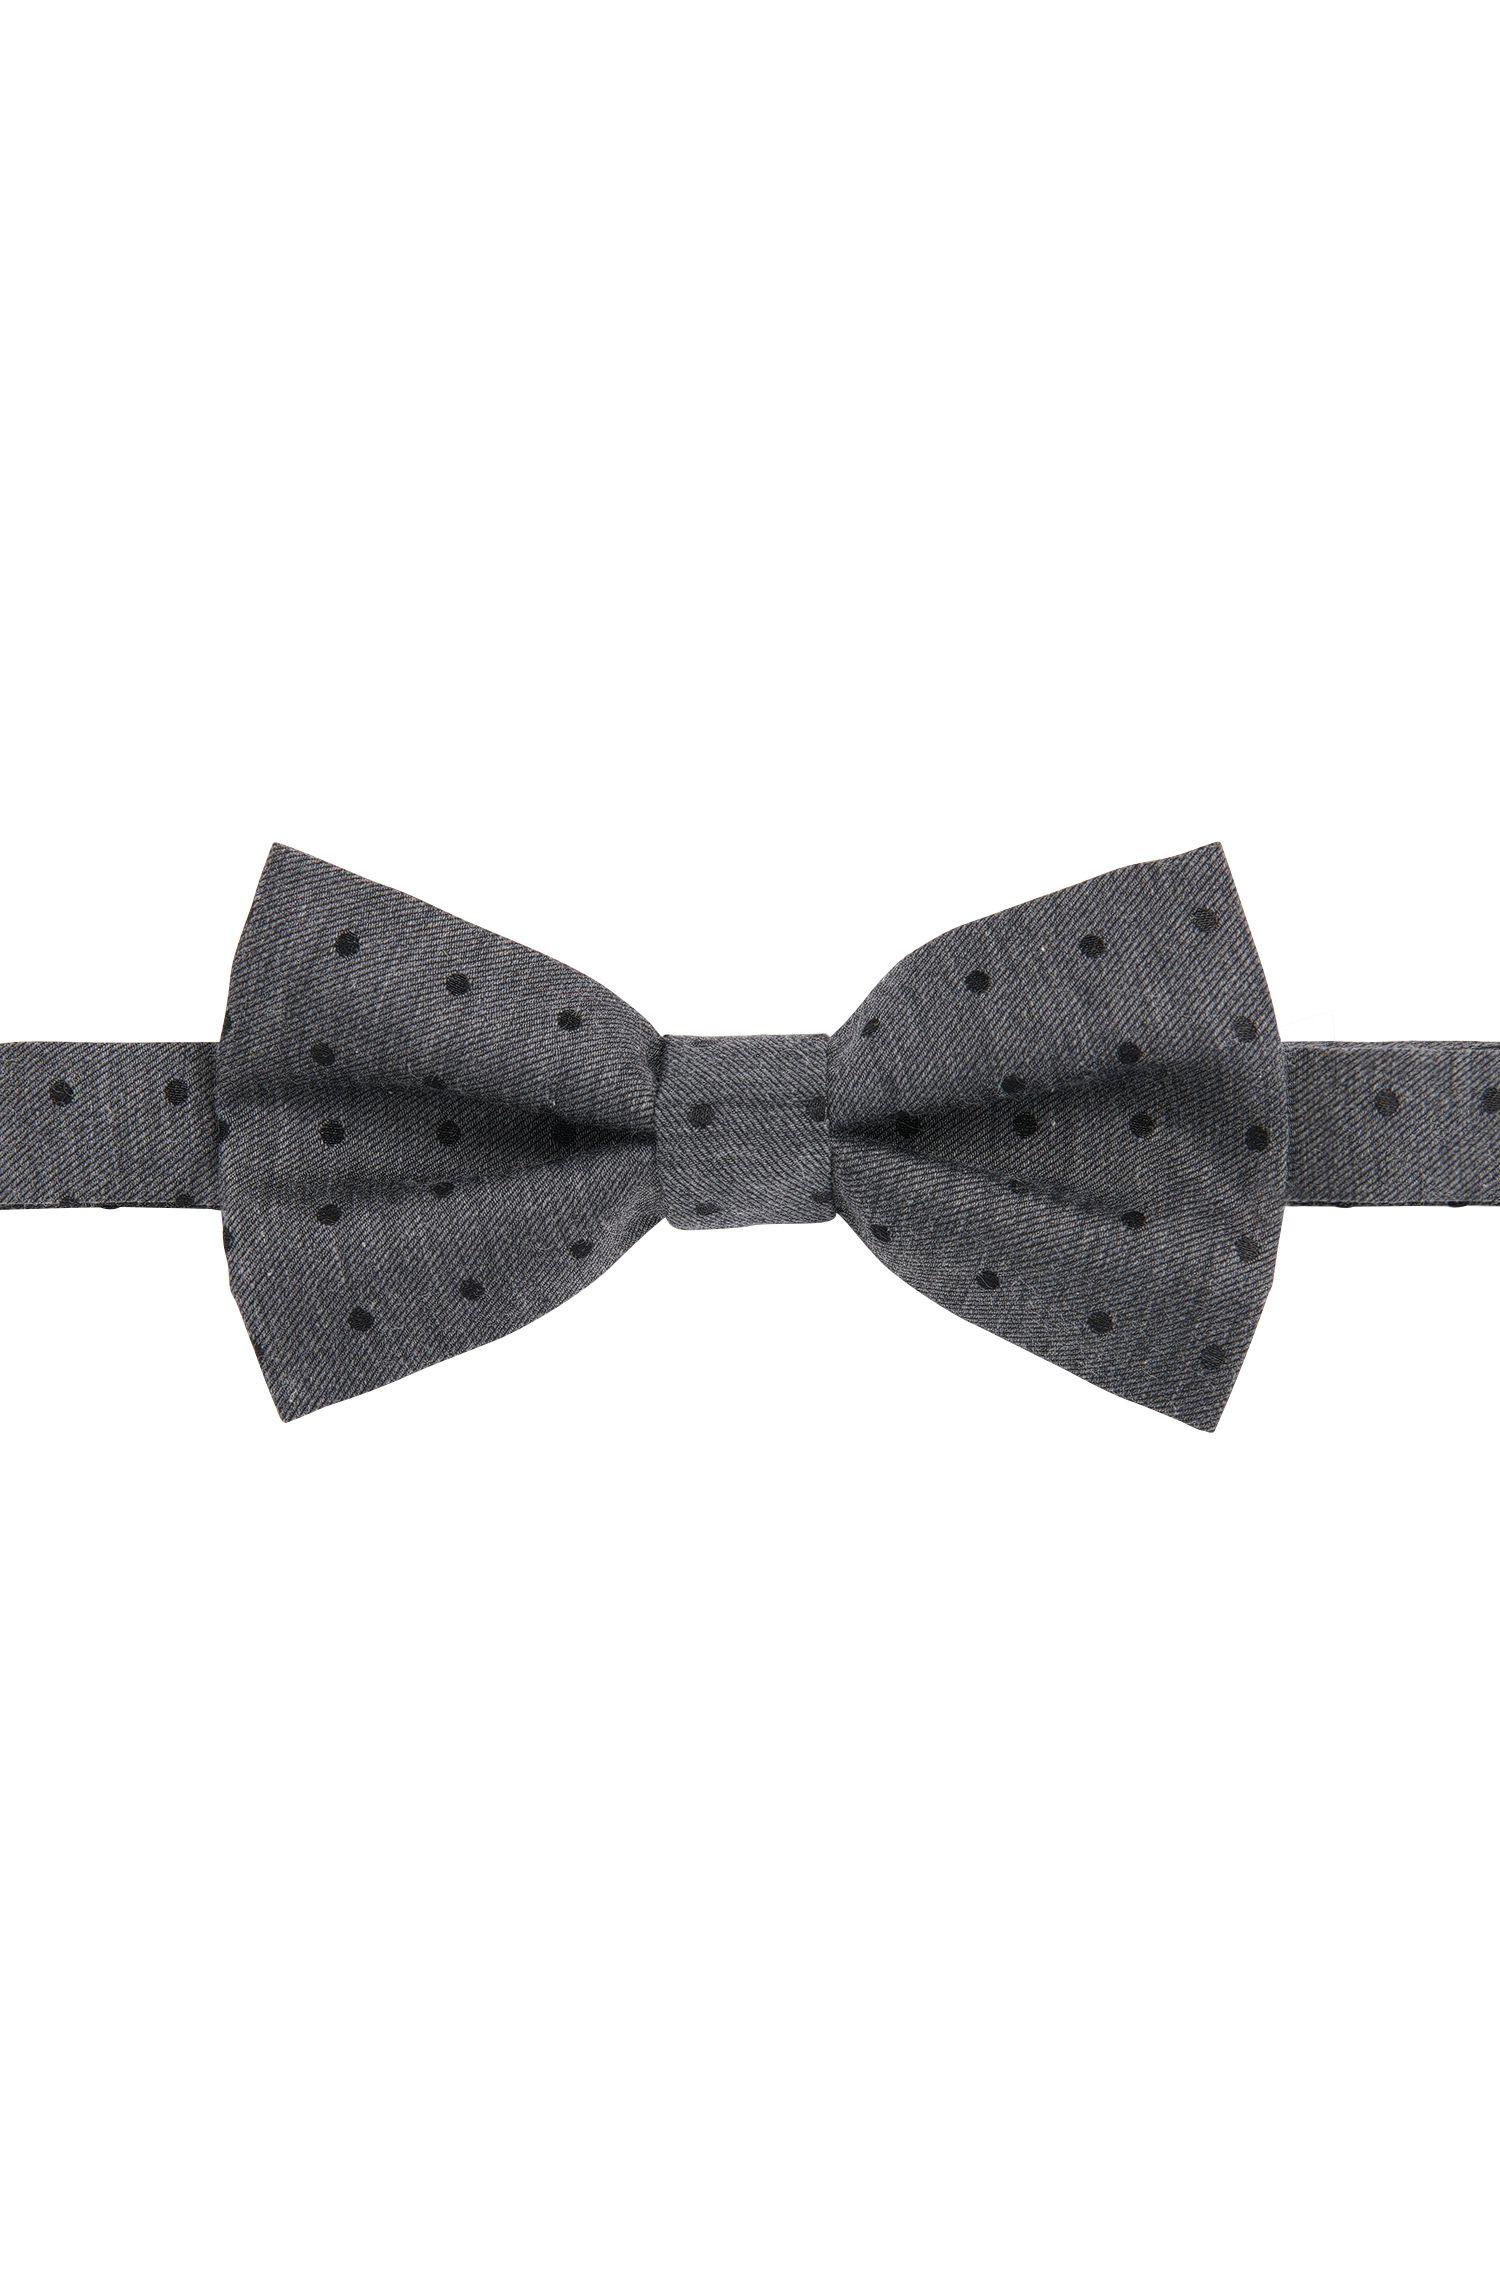 'Big Bow Tie' | Cotton Silk Chasmere Wool Bow Tie